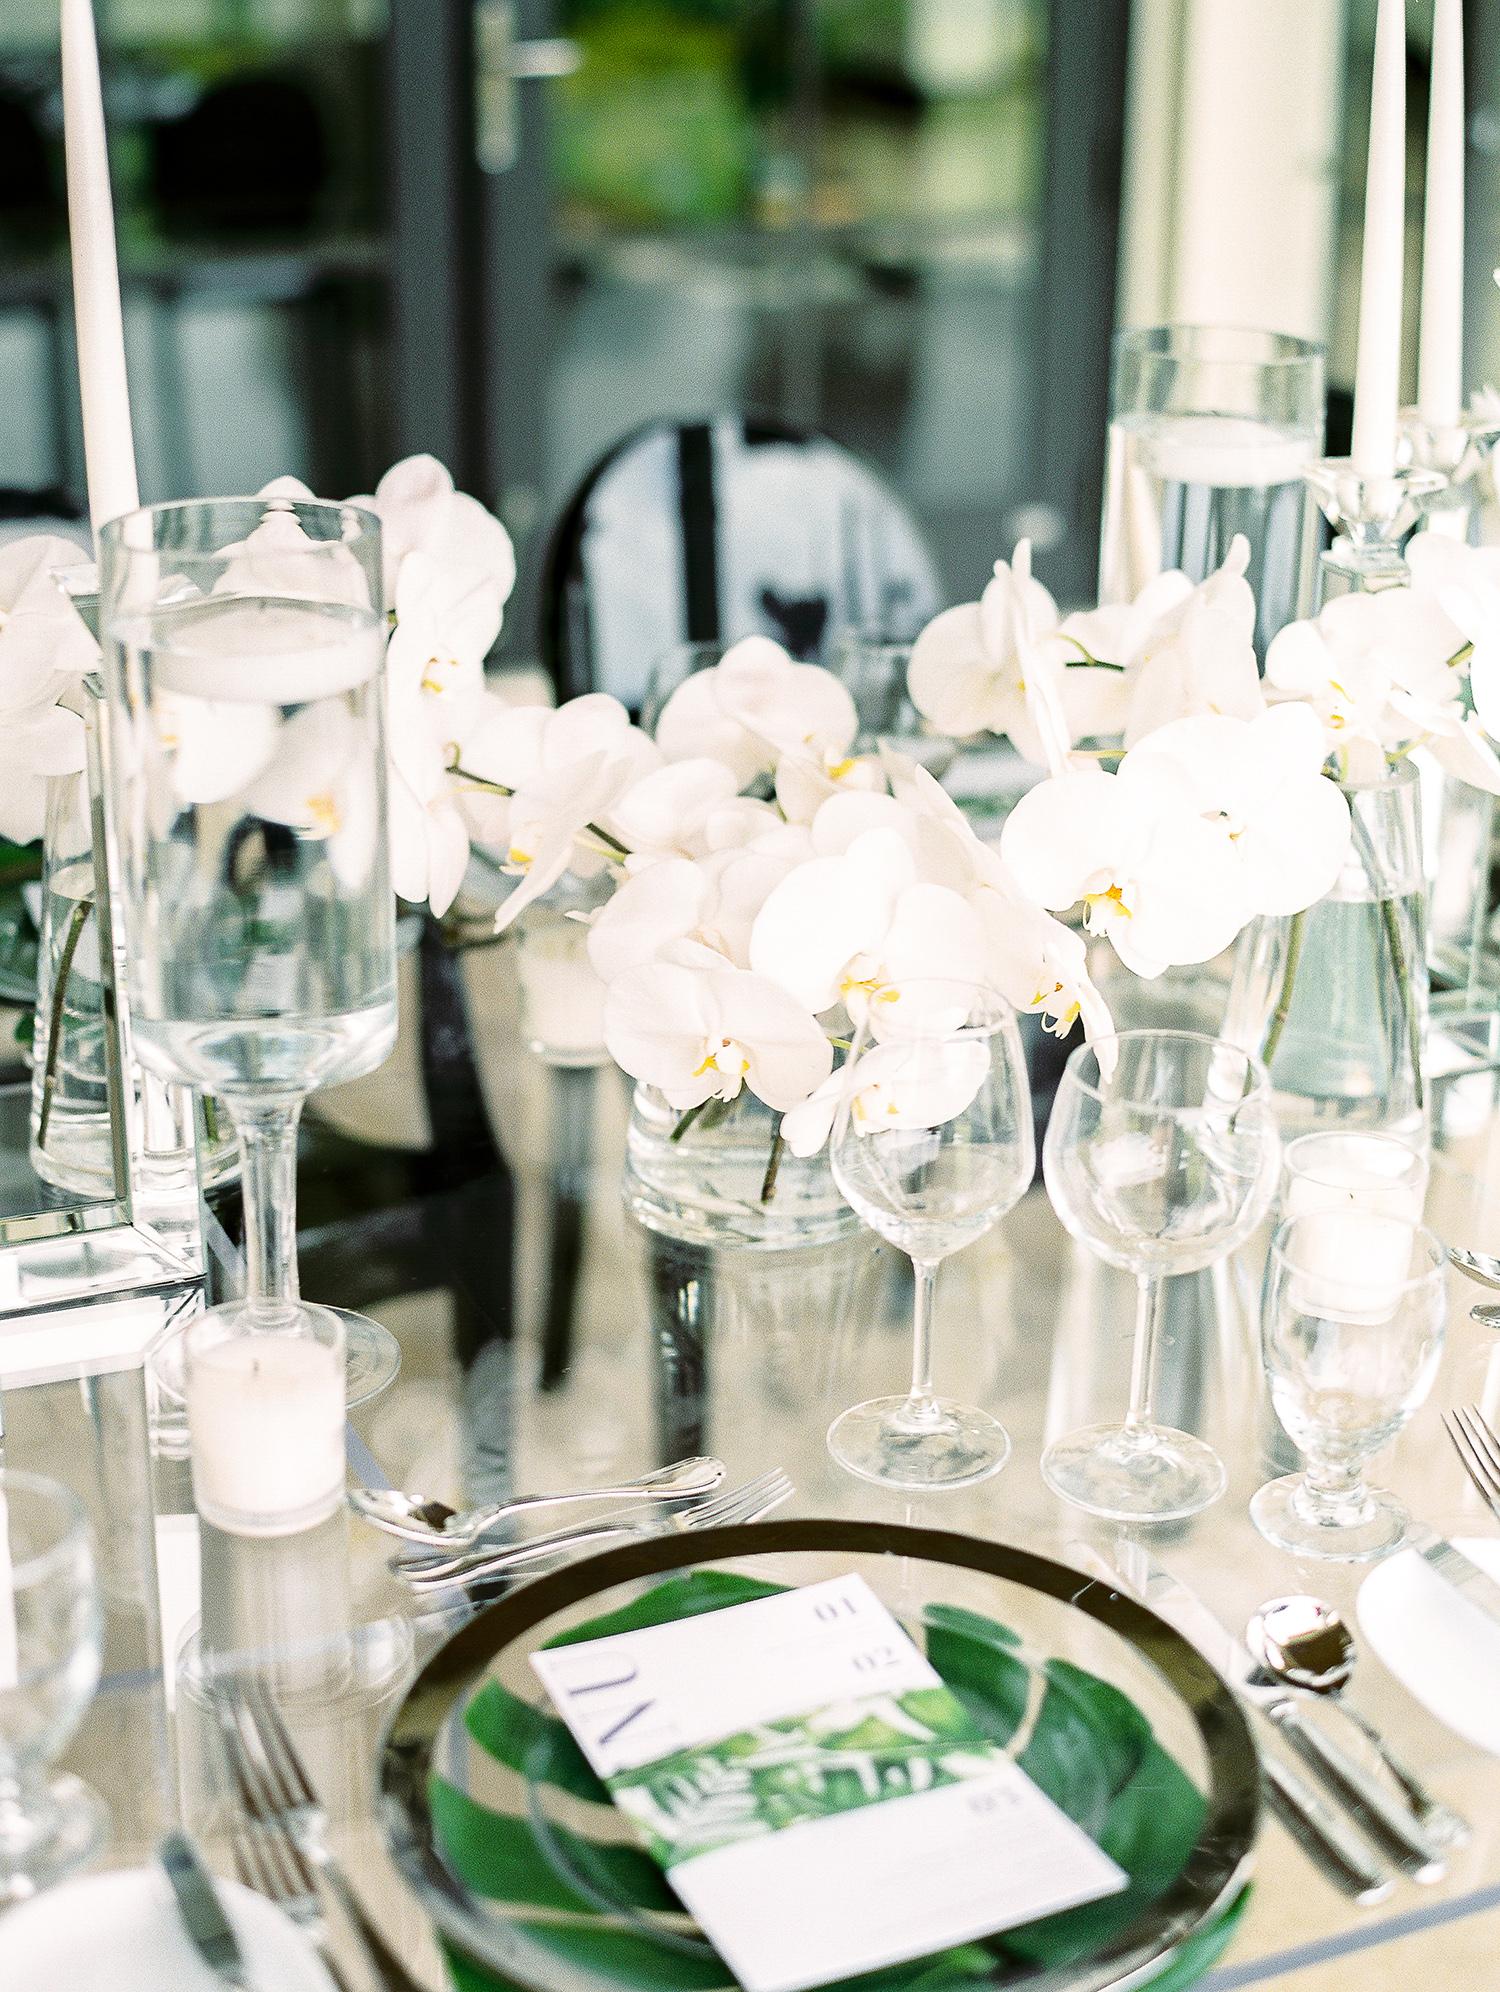 melissa leighton wedding centerpieces green chargers